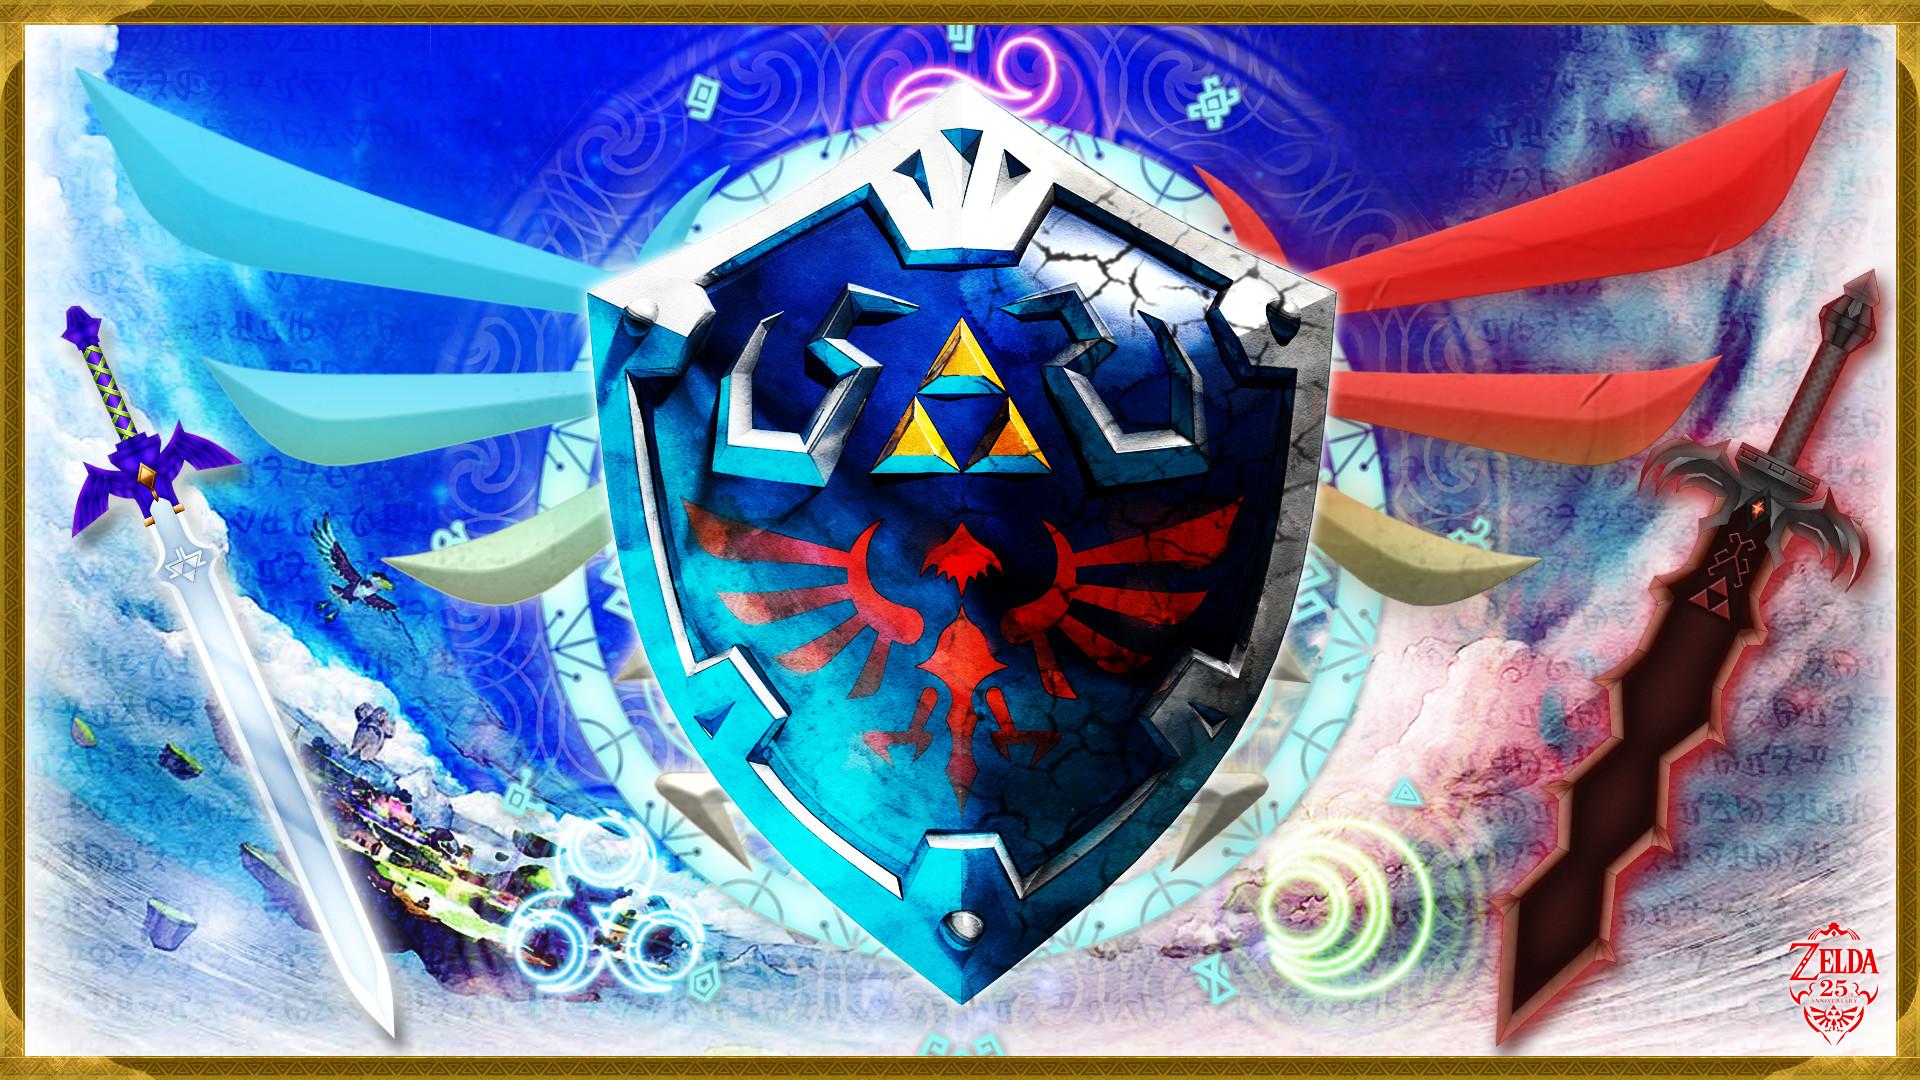 px Superb 4K Ultra HD Wallpapers of Legend Of Zelda Skyward  Sword, Full HD